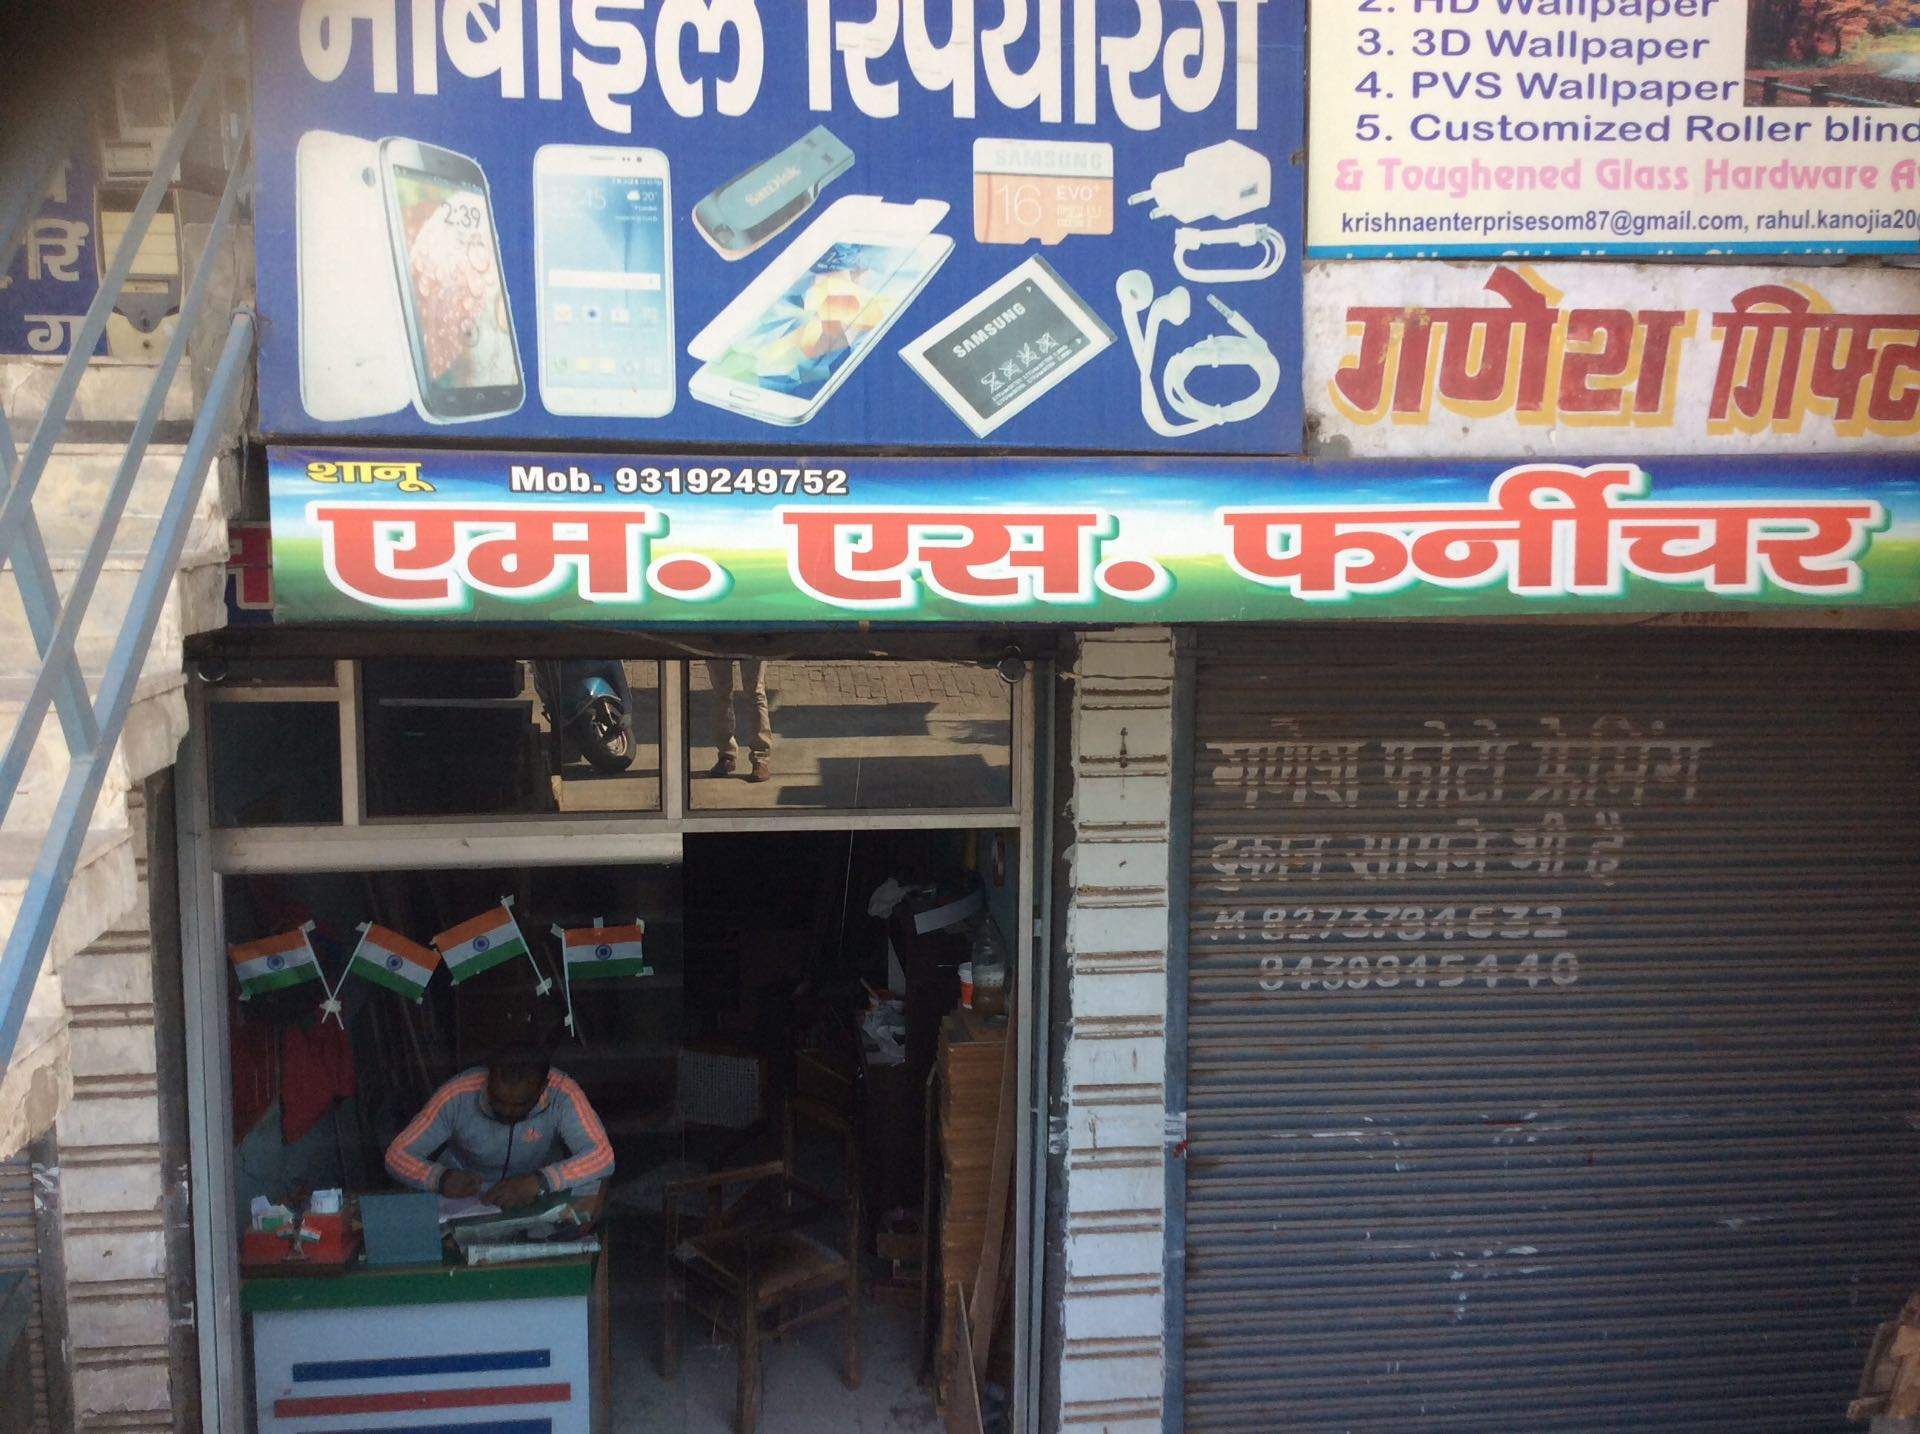 M S Furniture, Meerut City - Furniture Dealers in Meerut - Justdial